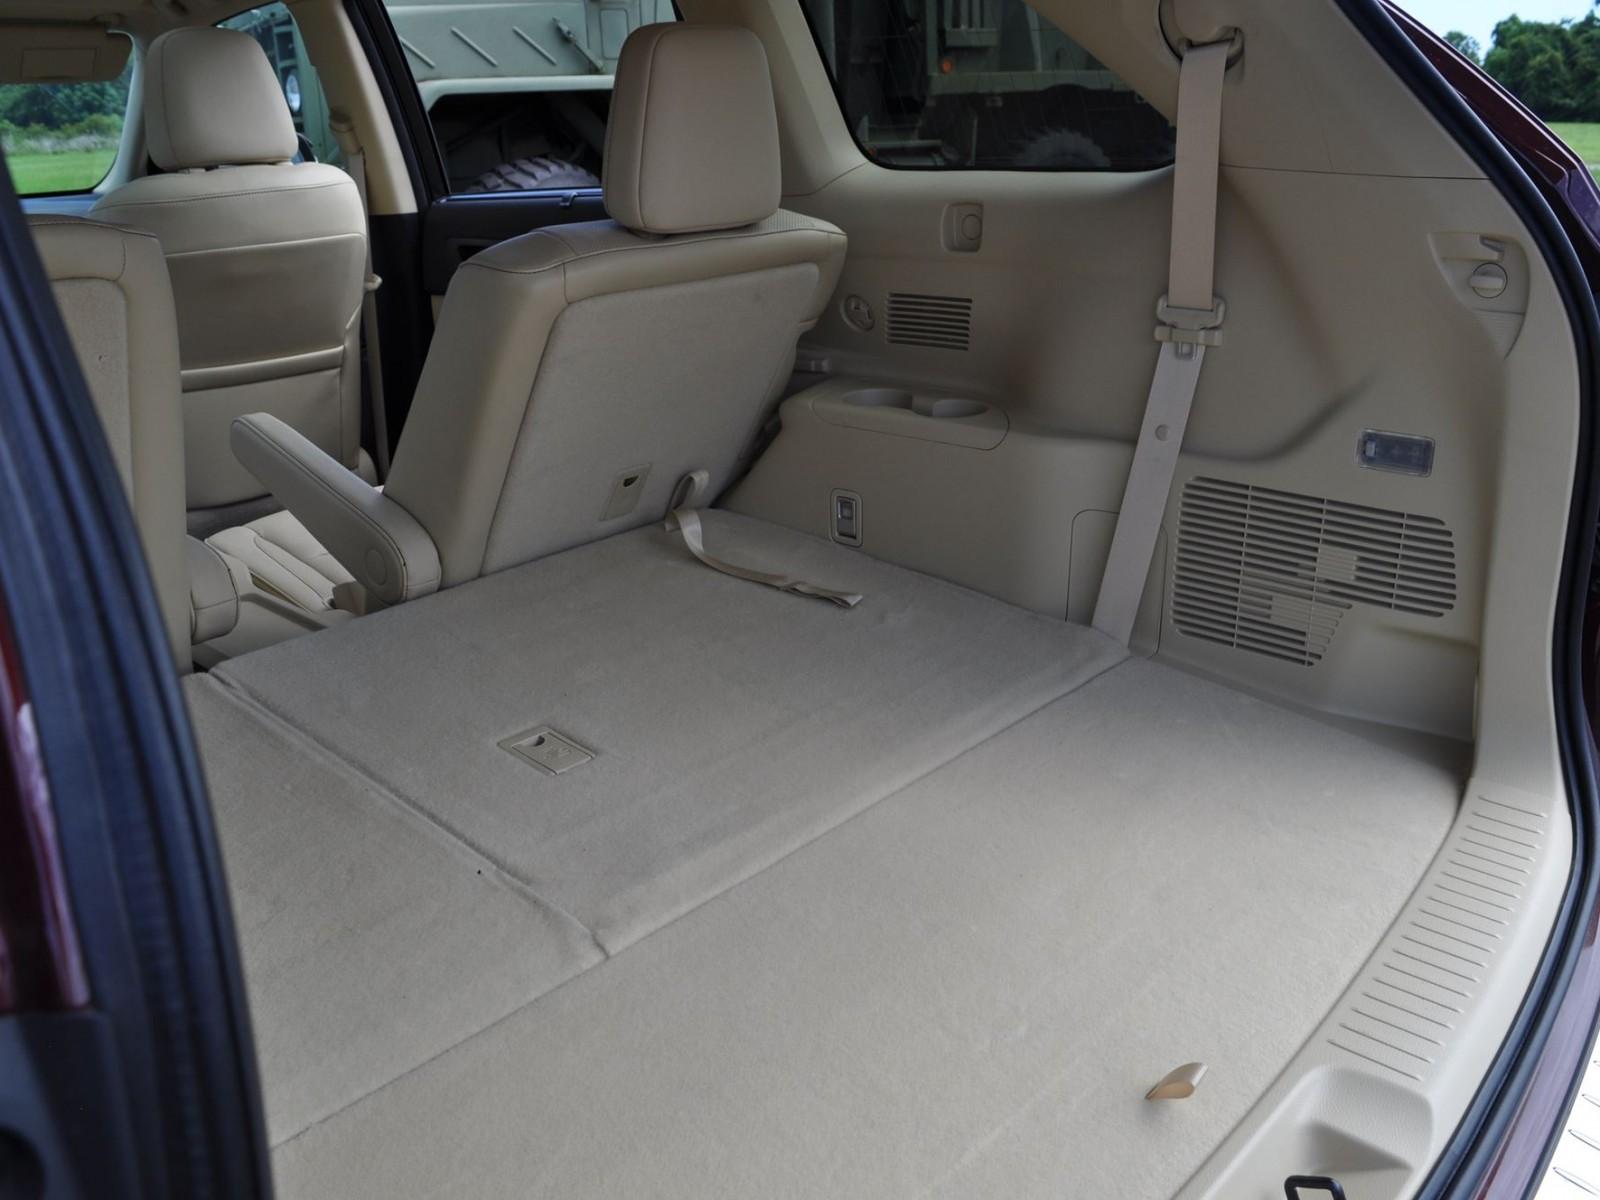 2015 Toyota Highlander Awd Limited Interior Photos 14